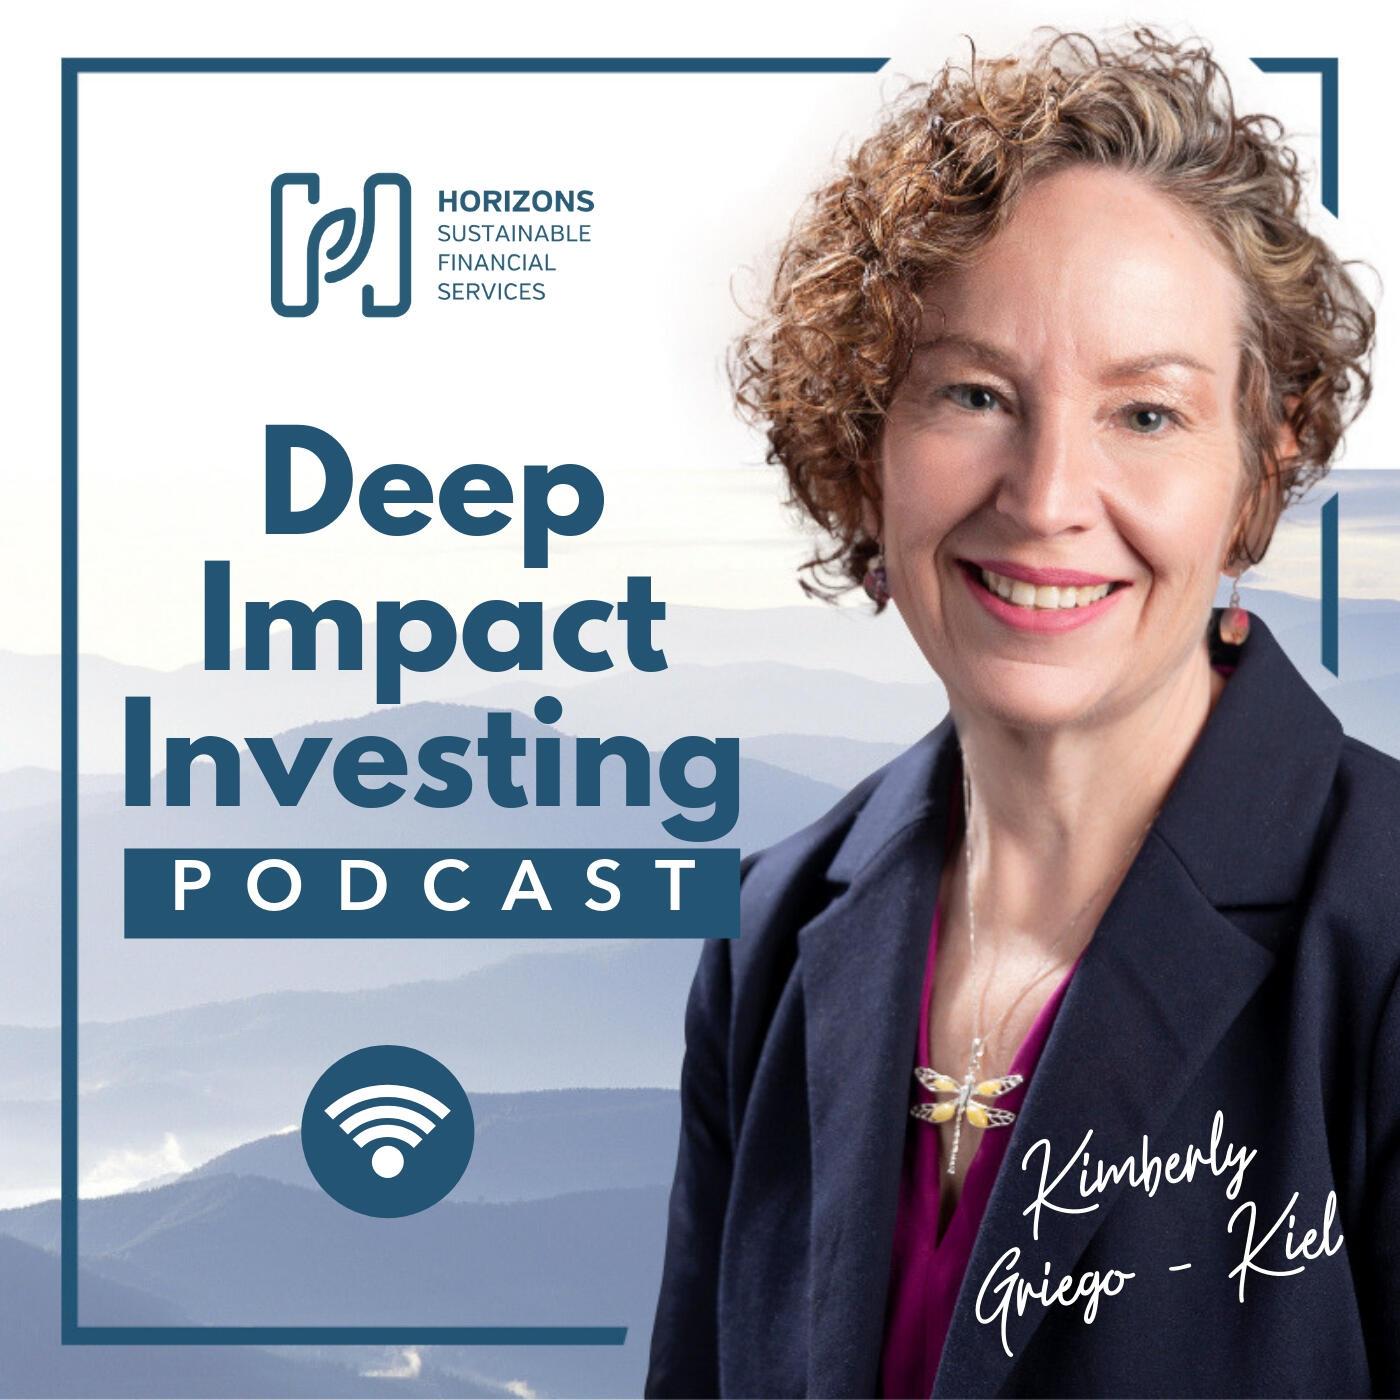 Deep Impact Investing